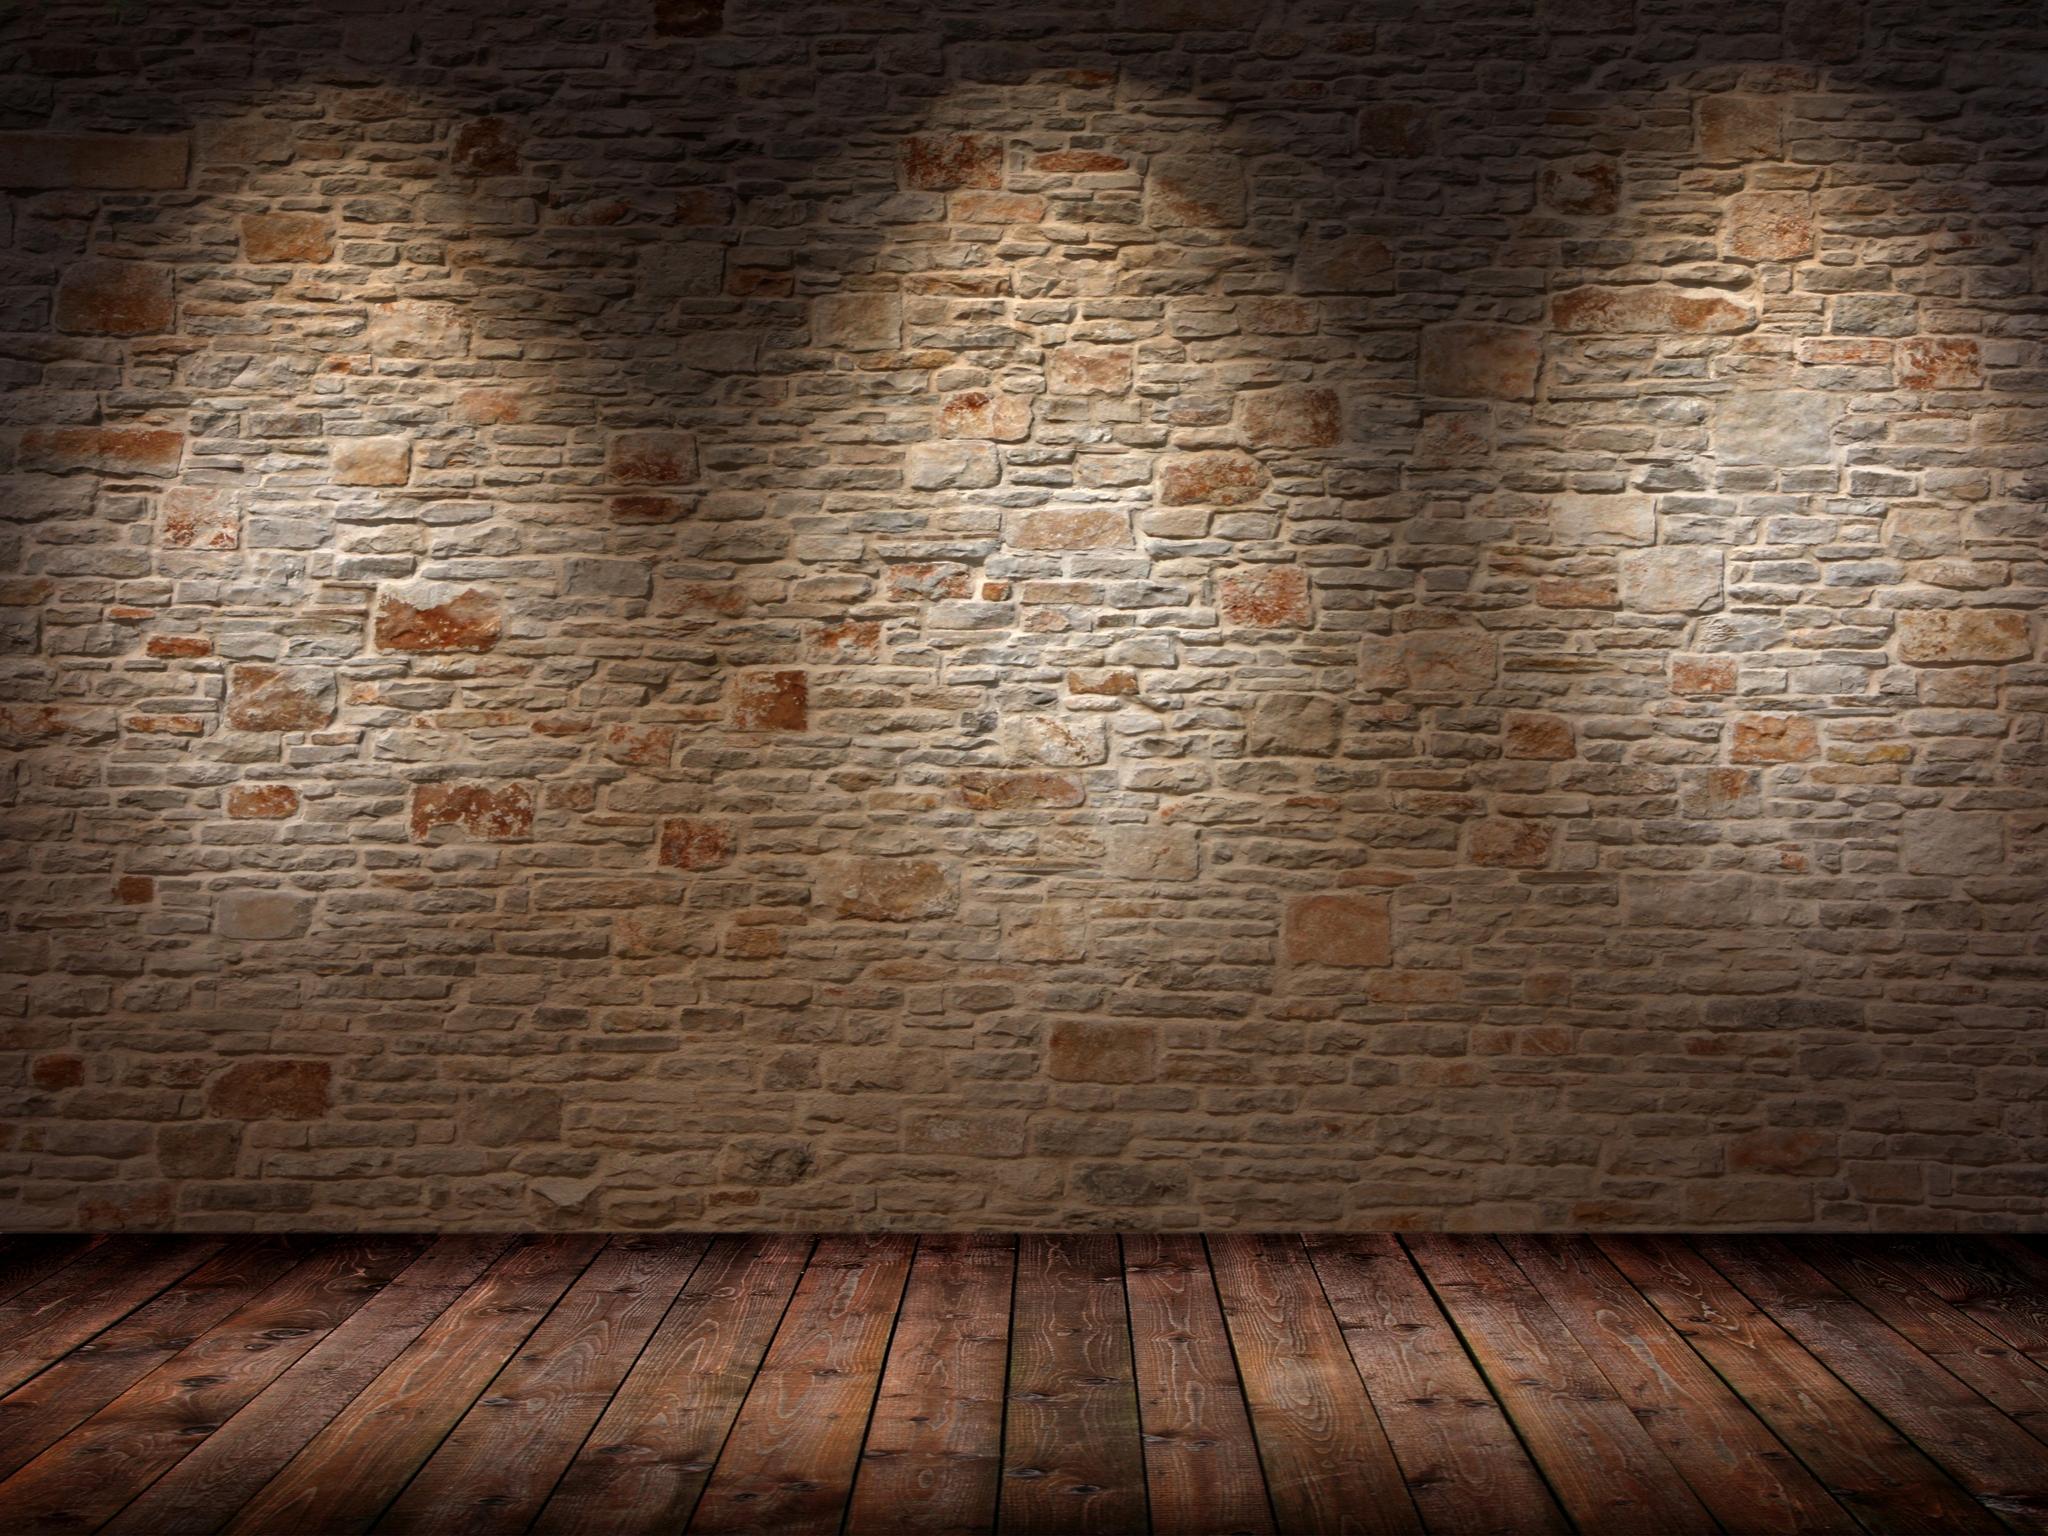 Wallpaper Walls Floor Light Shadow Surface 2048x1536